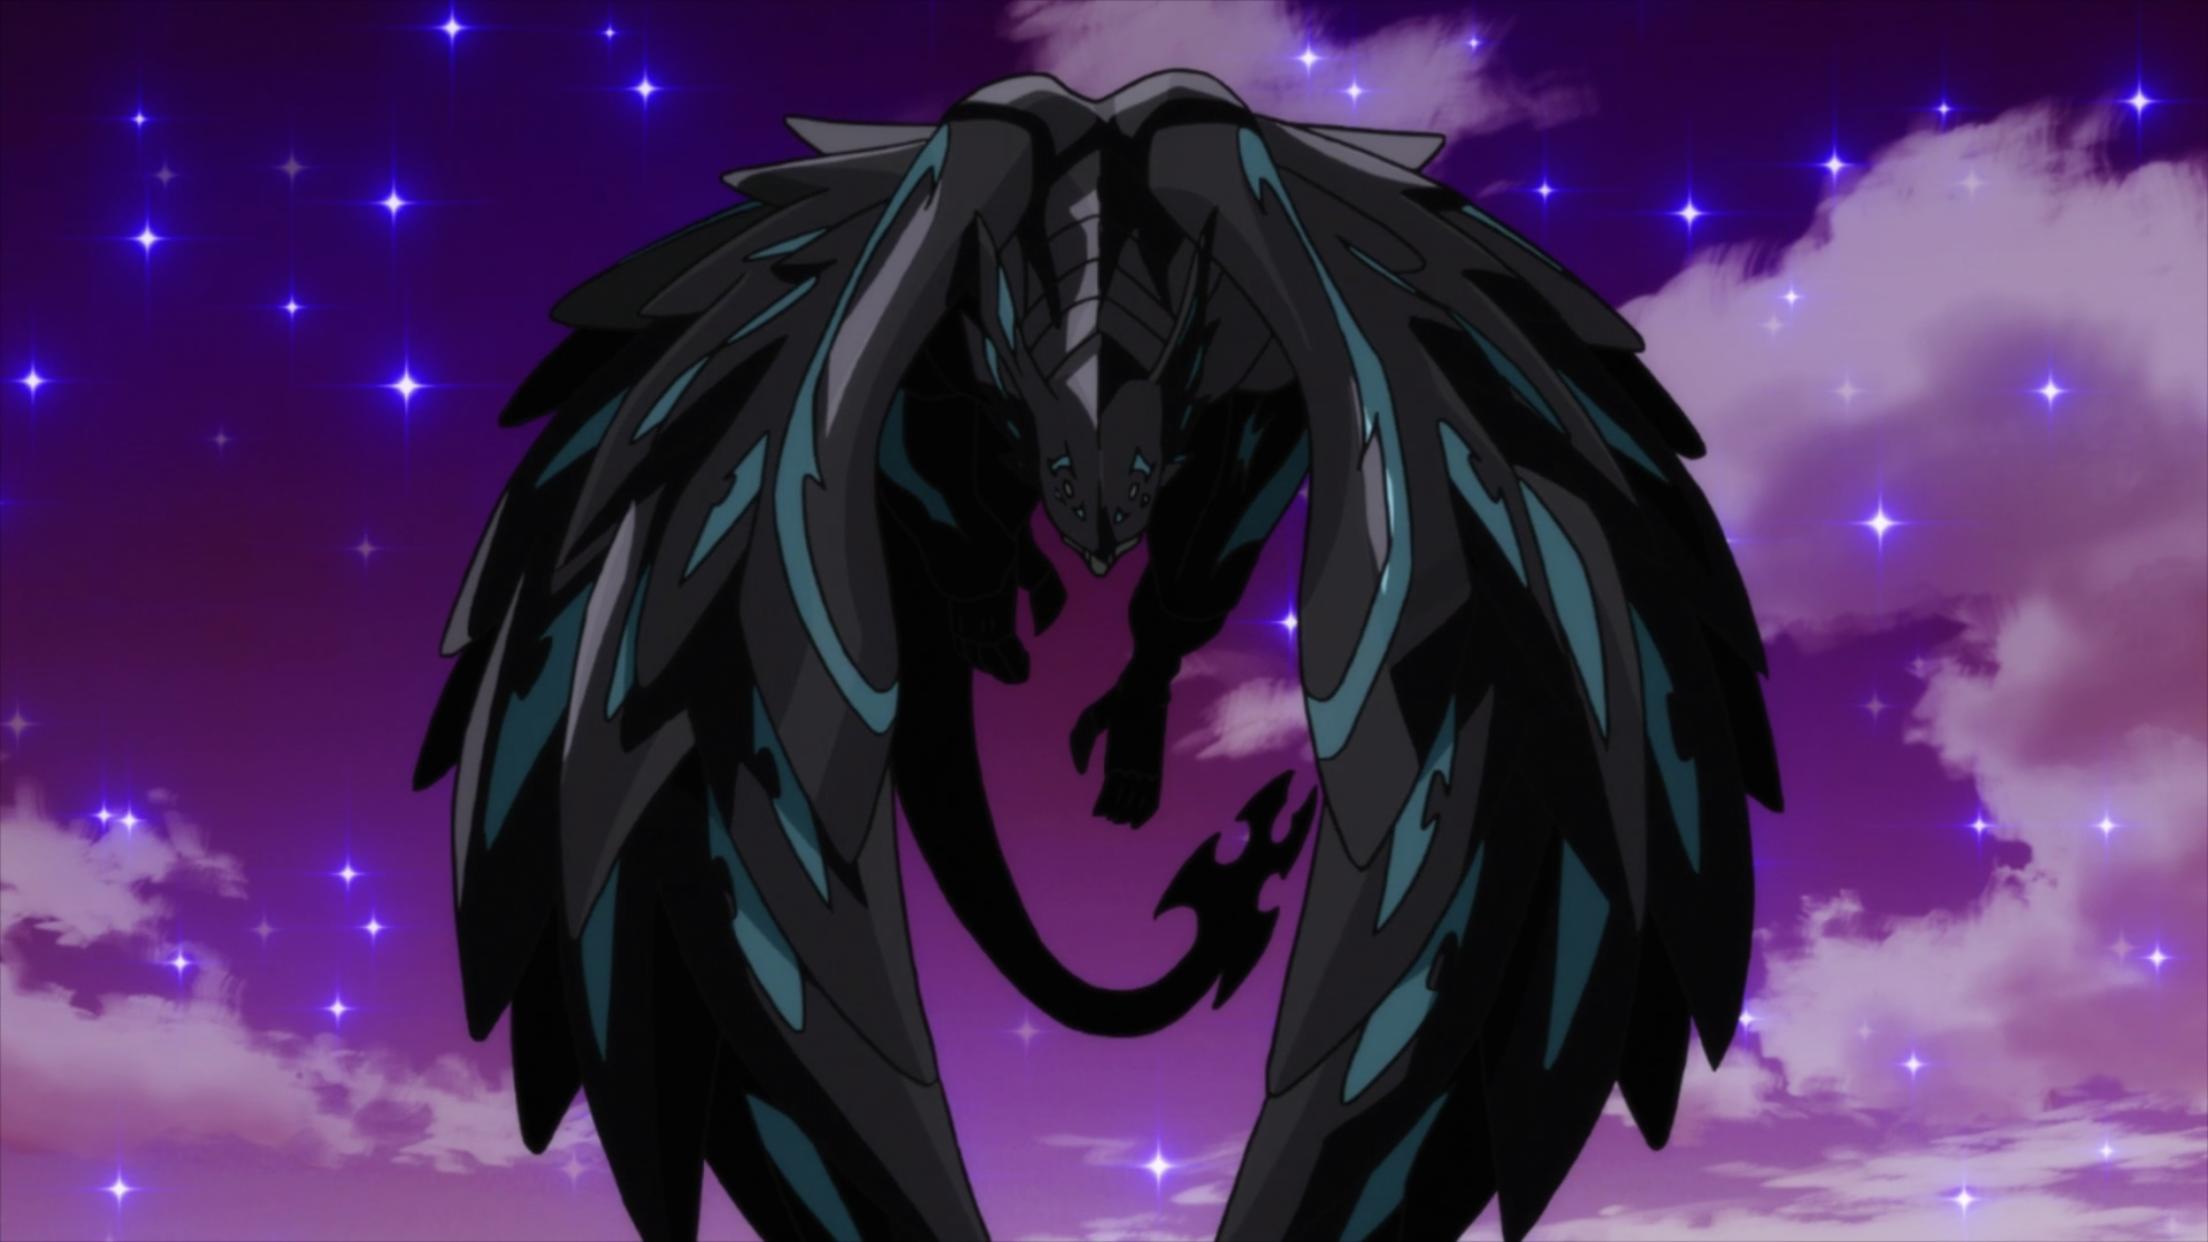 Fairy Tail 2018 Episode 49 Fairy tail, Fairy, Anime